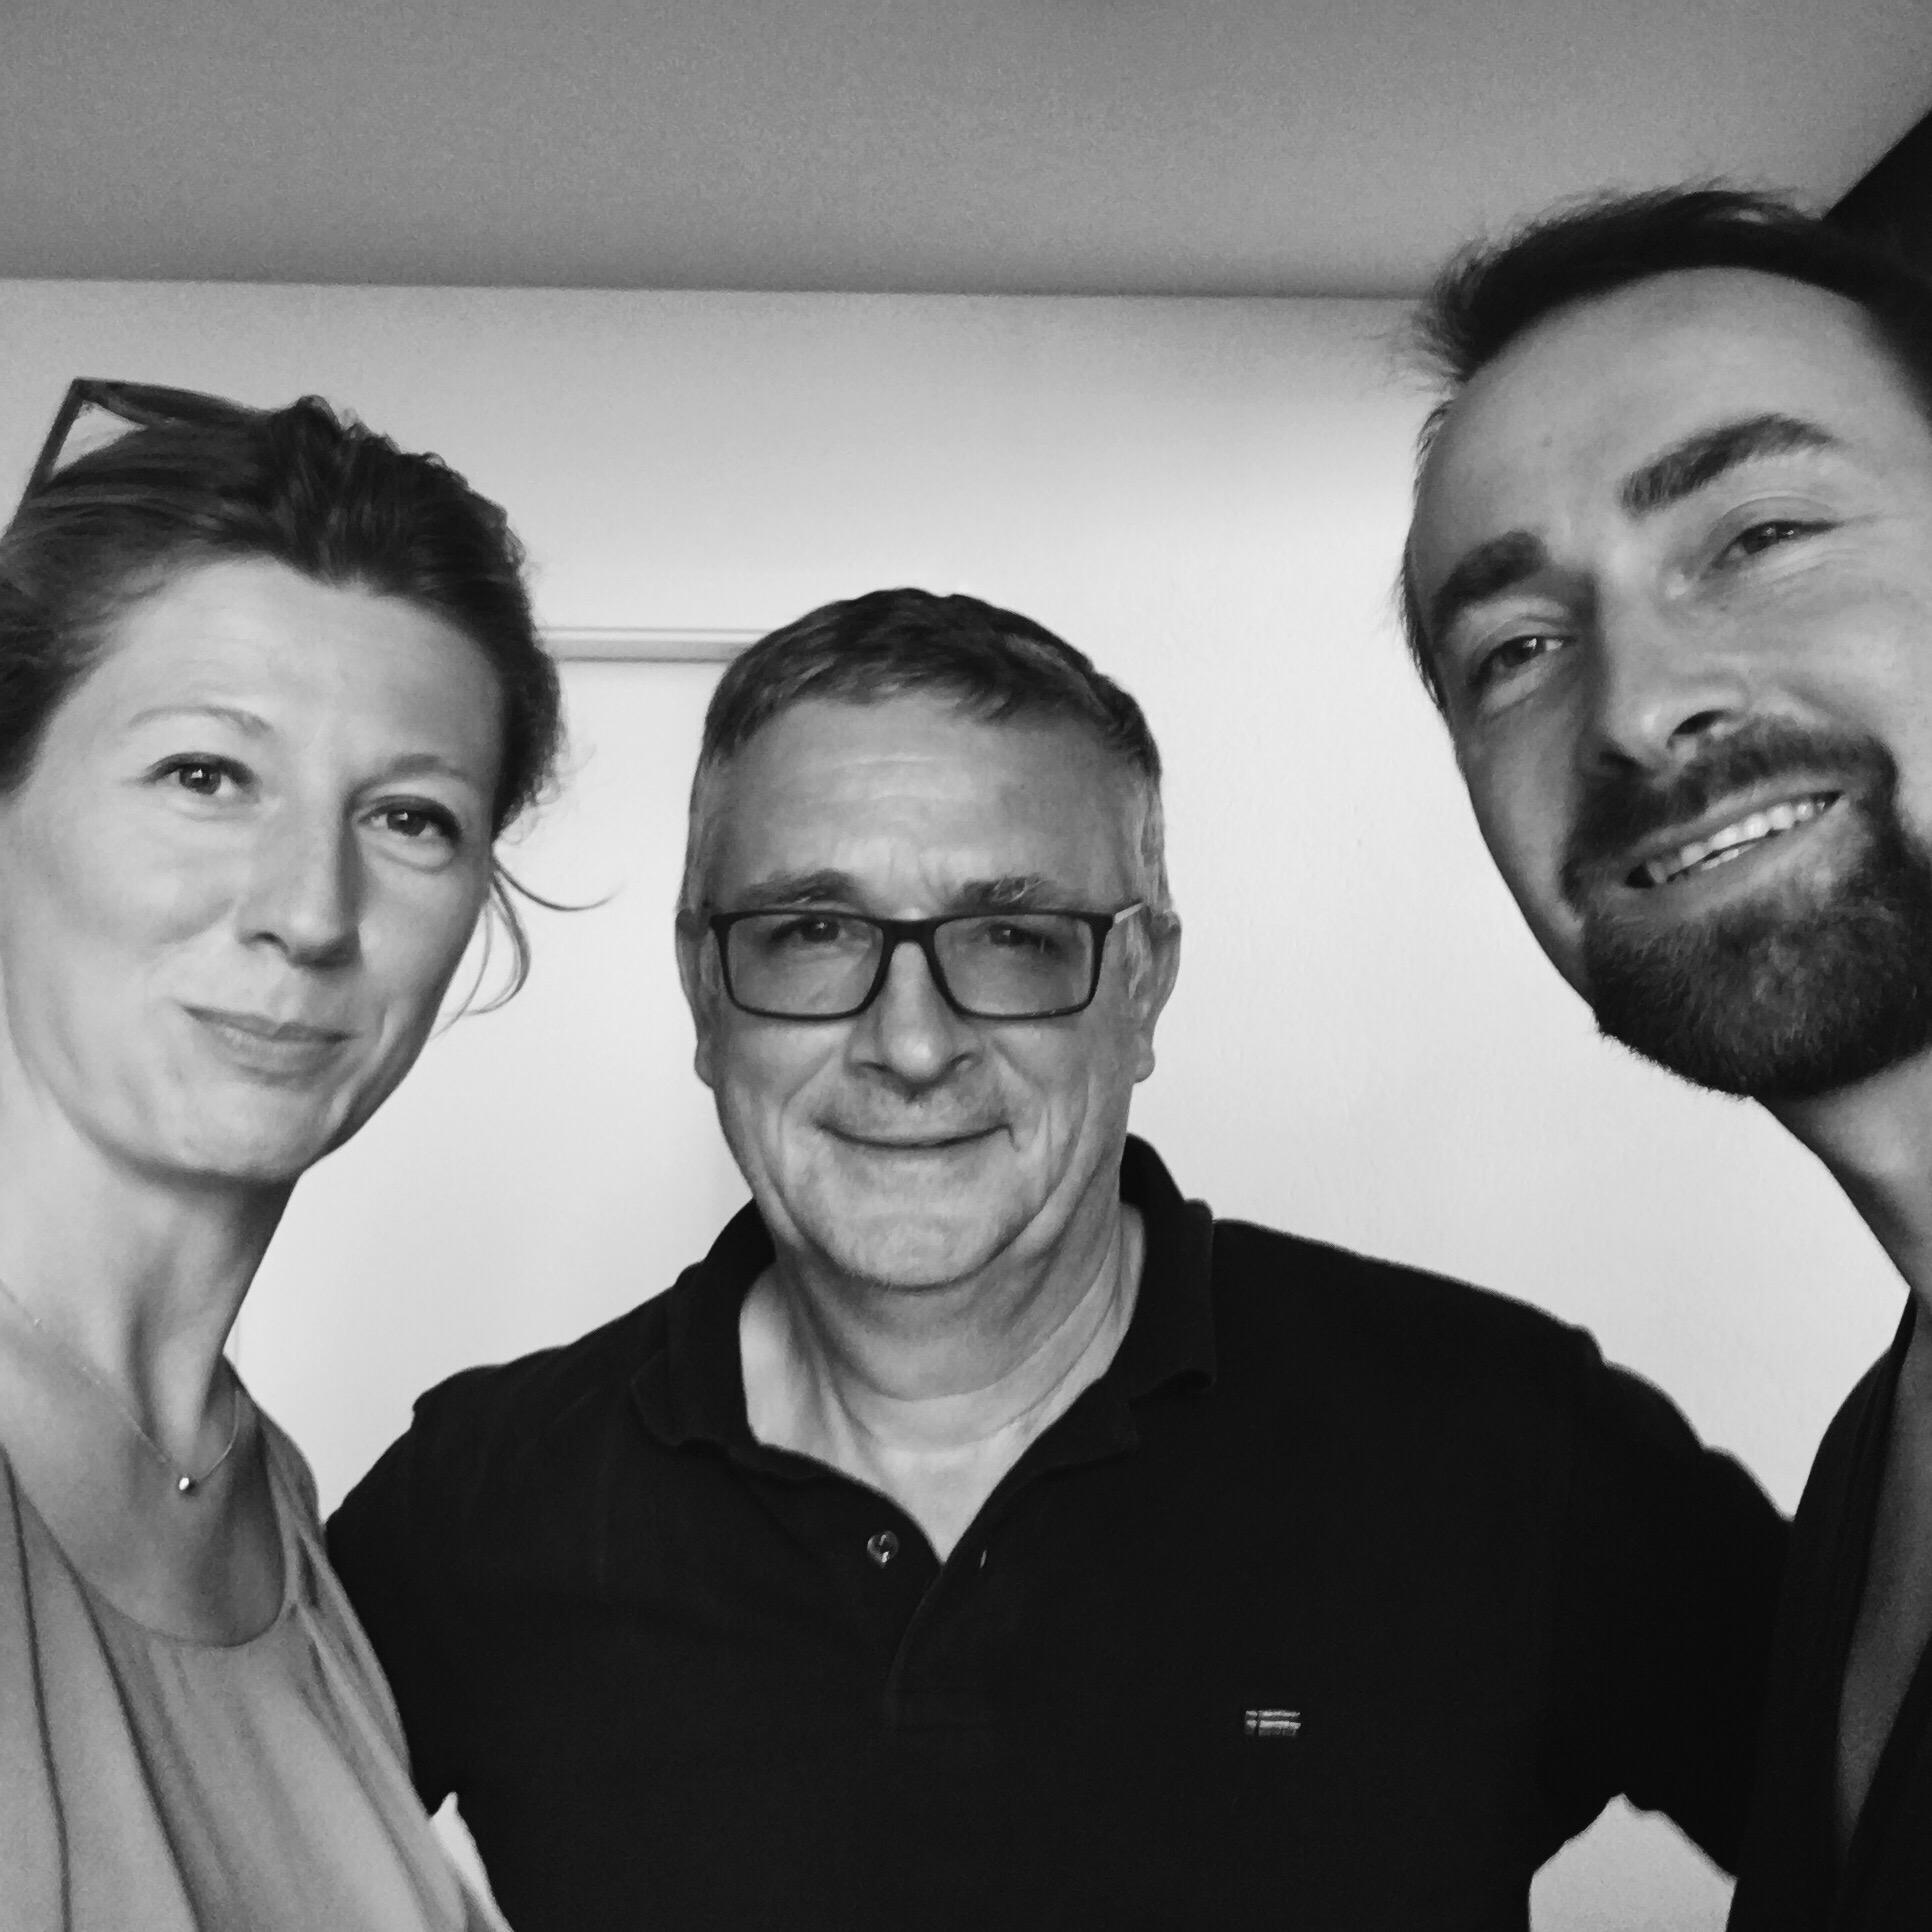 We met winemaker Hansjörg Rebholz from Ökonomierat Rebholz in the Pfalz region in his winery in Siebeldingen.